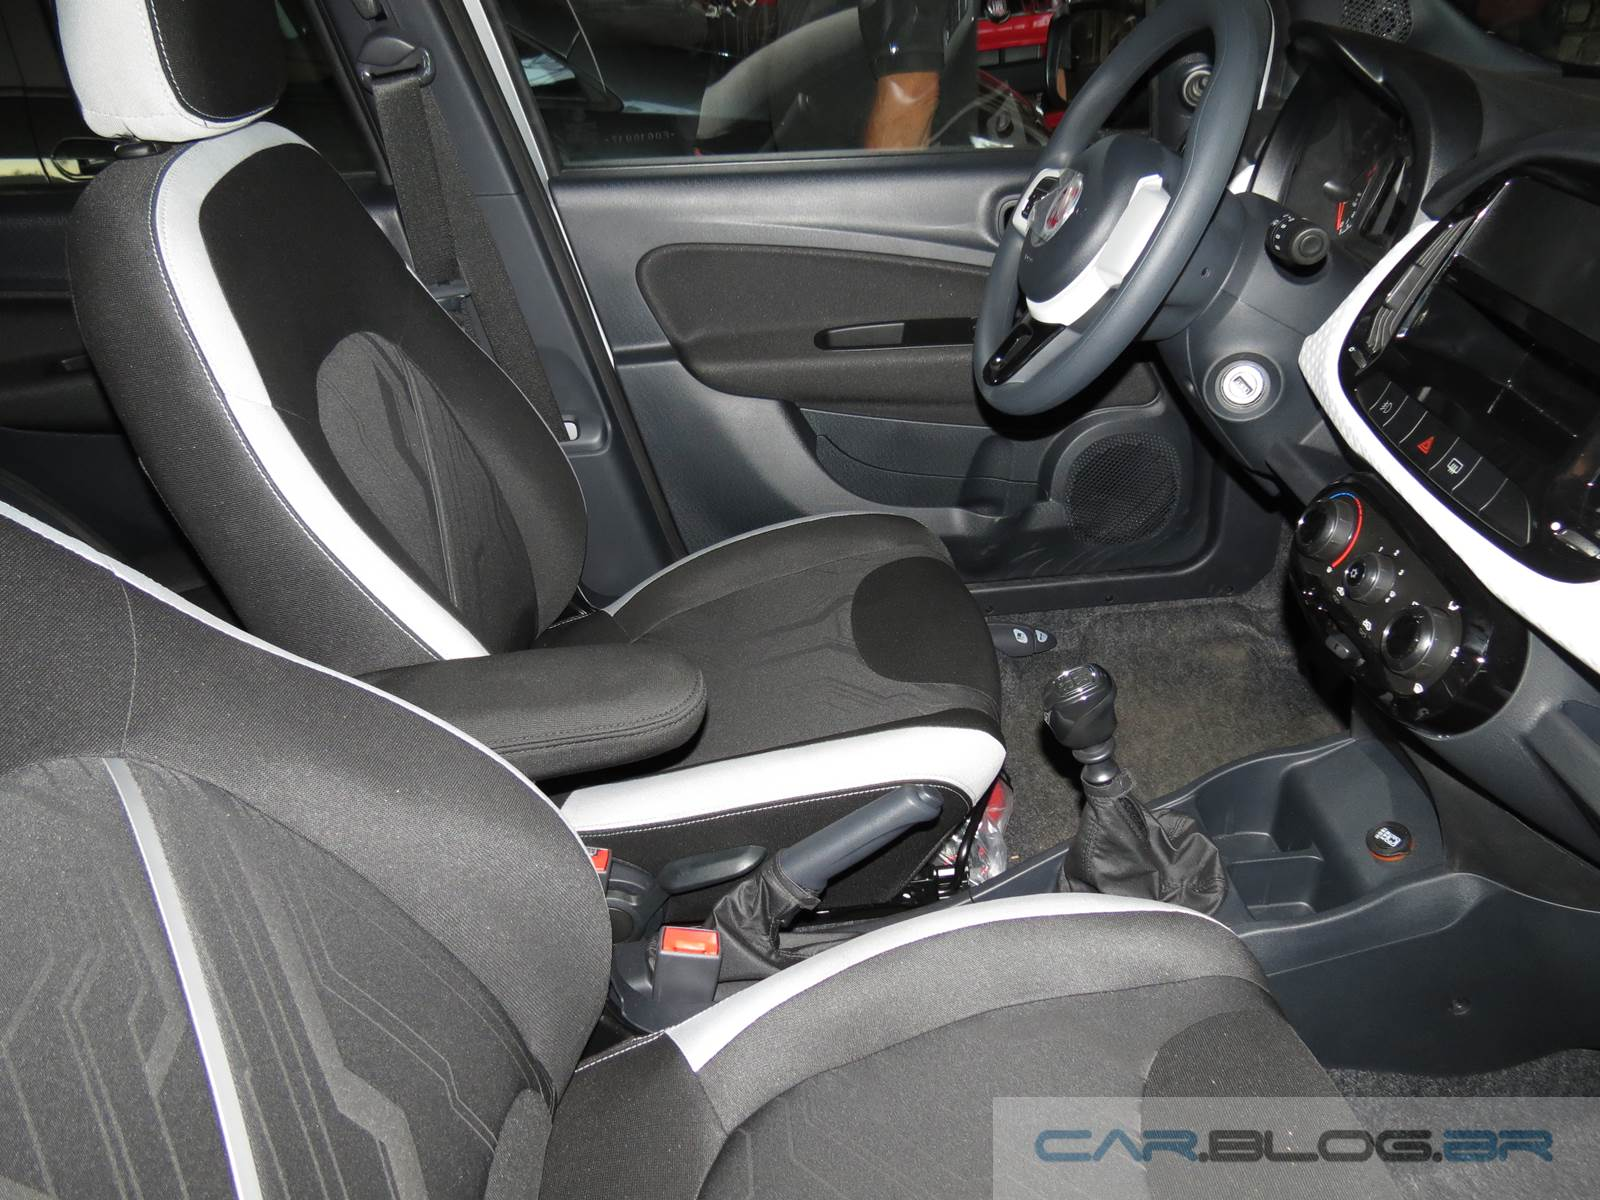 Novo Fiat Uno 2016 terá motor de 3 cilindros com start-stop